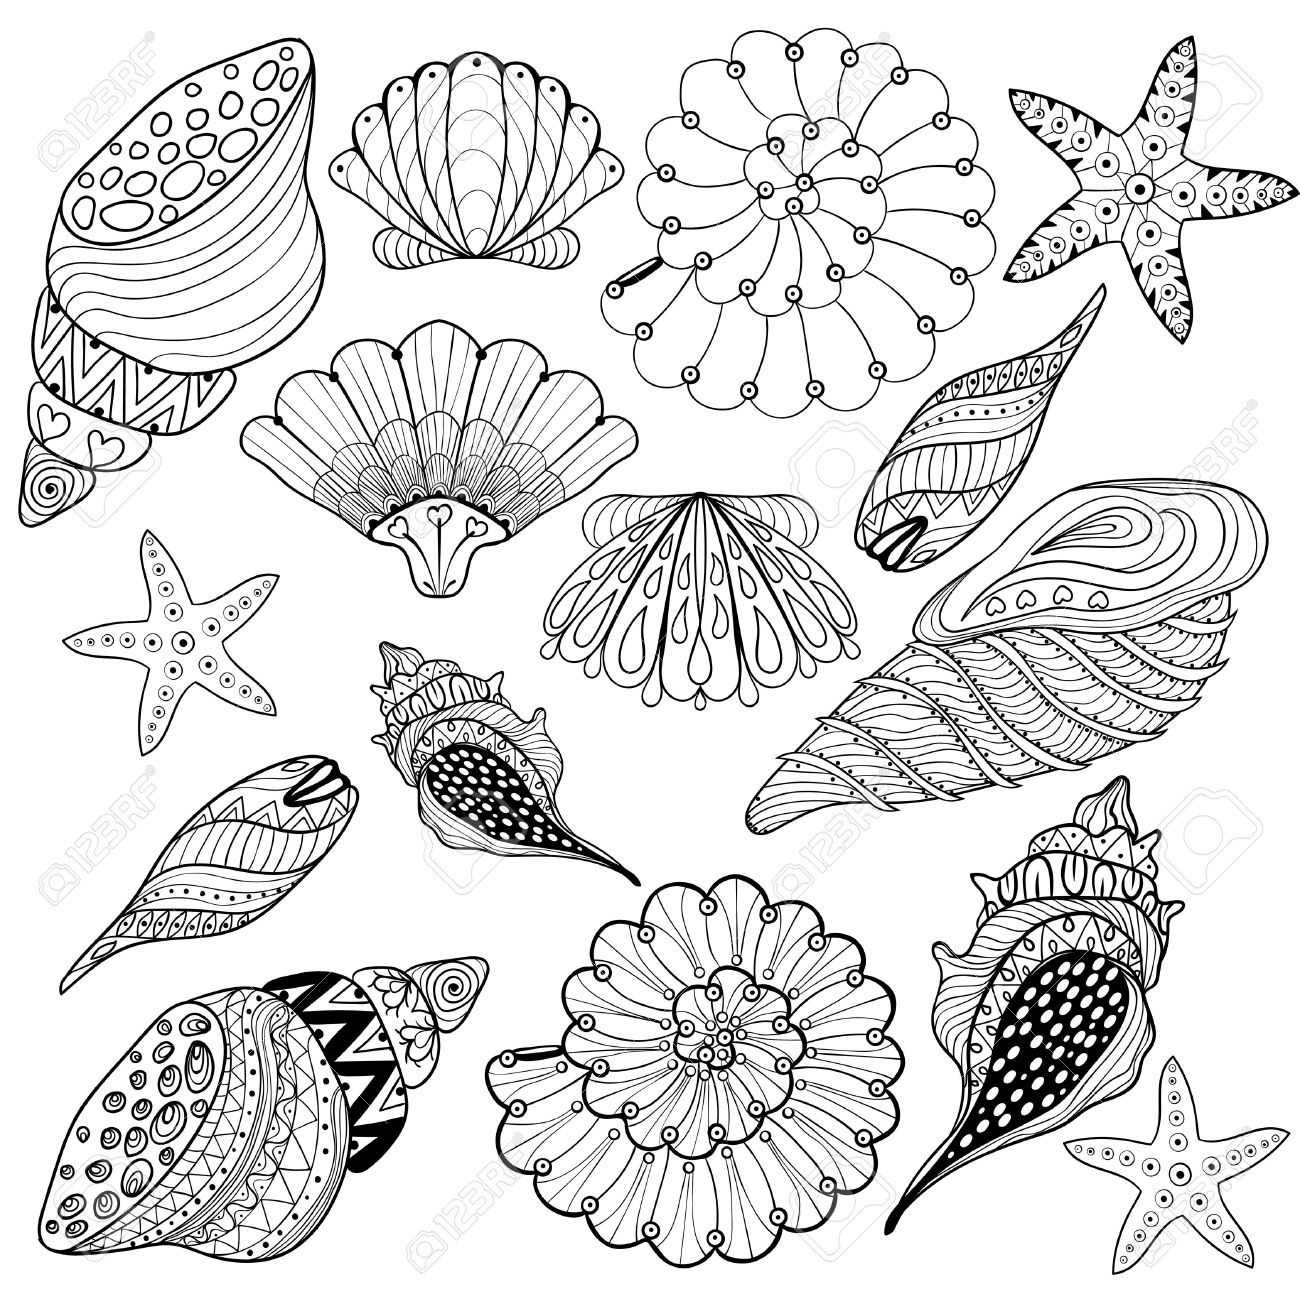 1300x1299 Vector Set Shells, Zentangle Seashells For Adult Anti Stress